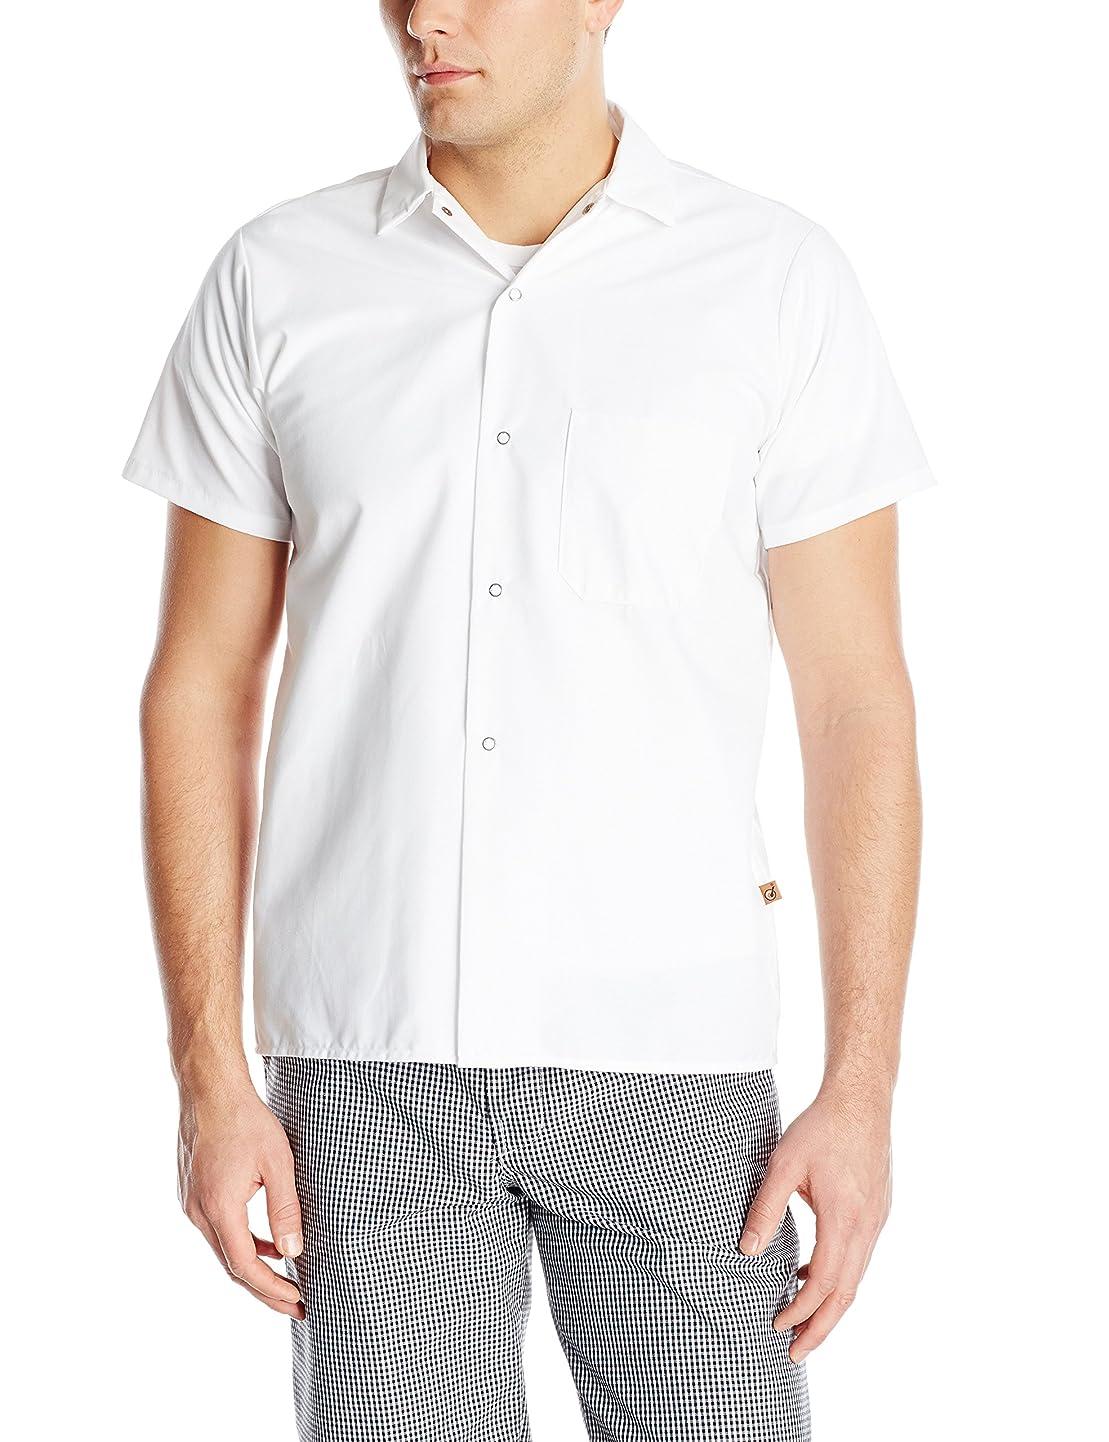 Chef Designs Men's RK Cook Shirt ebfvsuddebs3